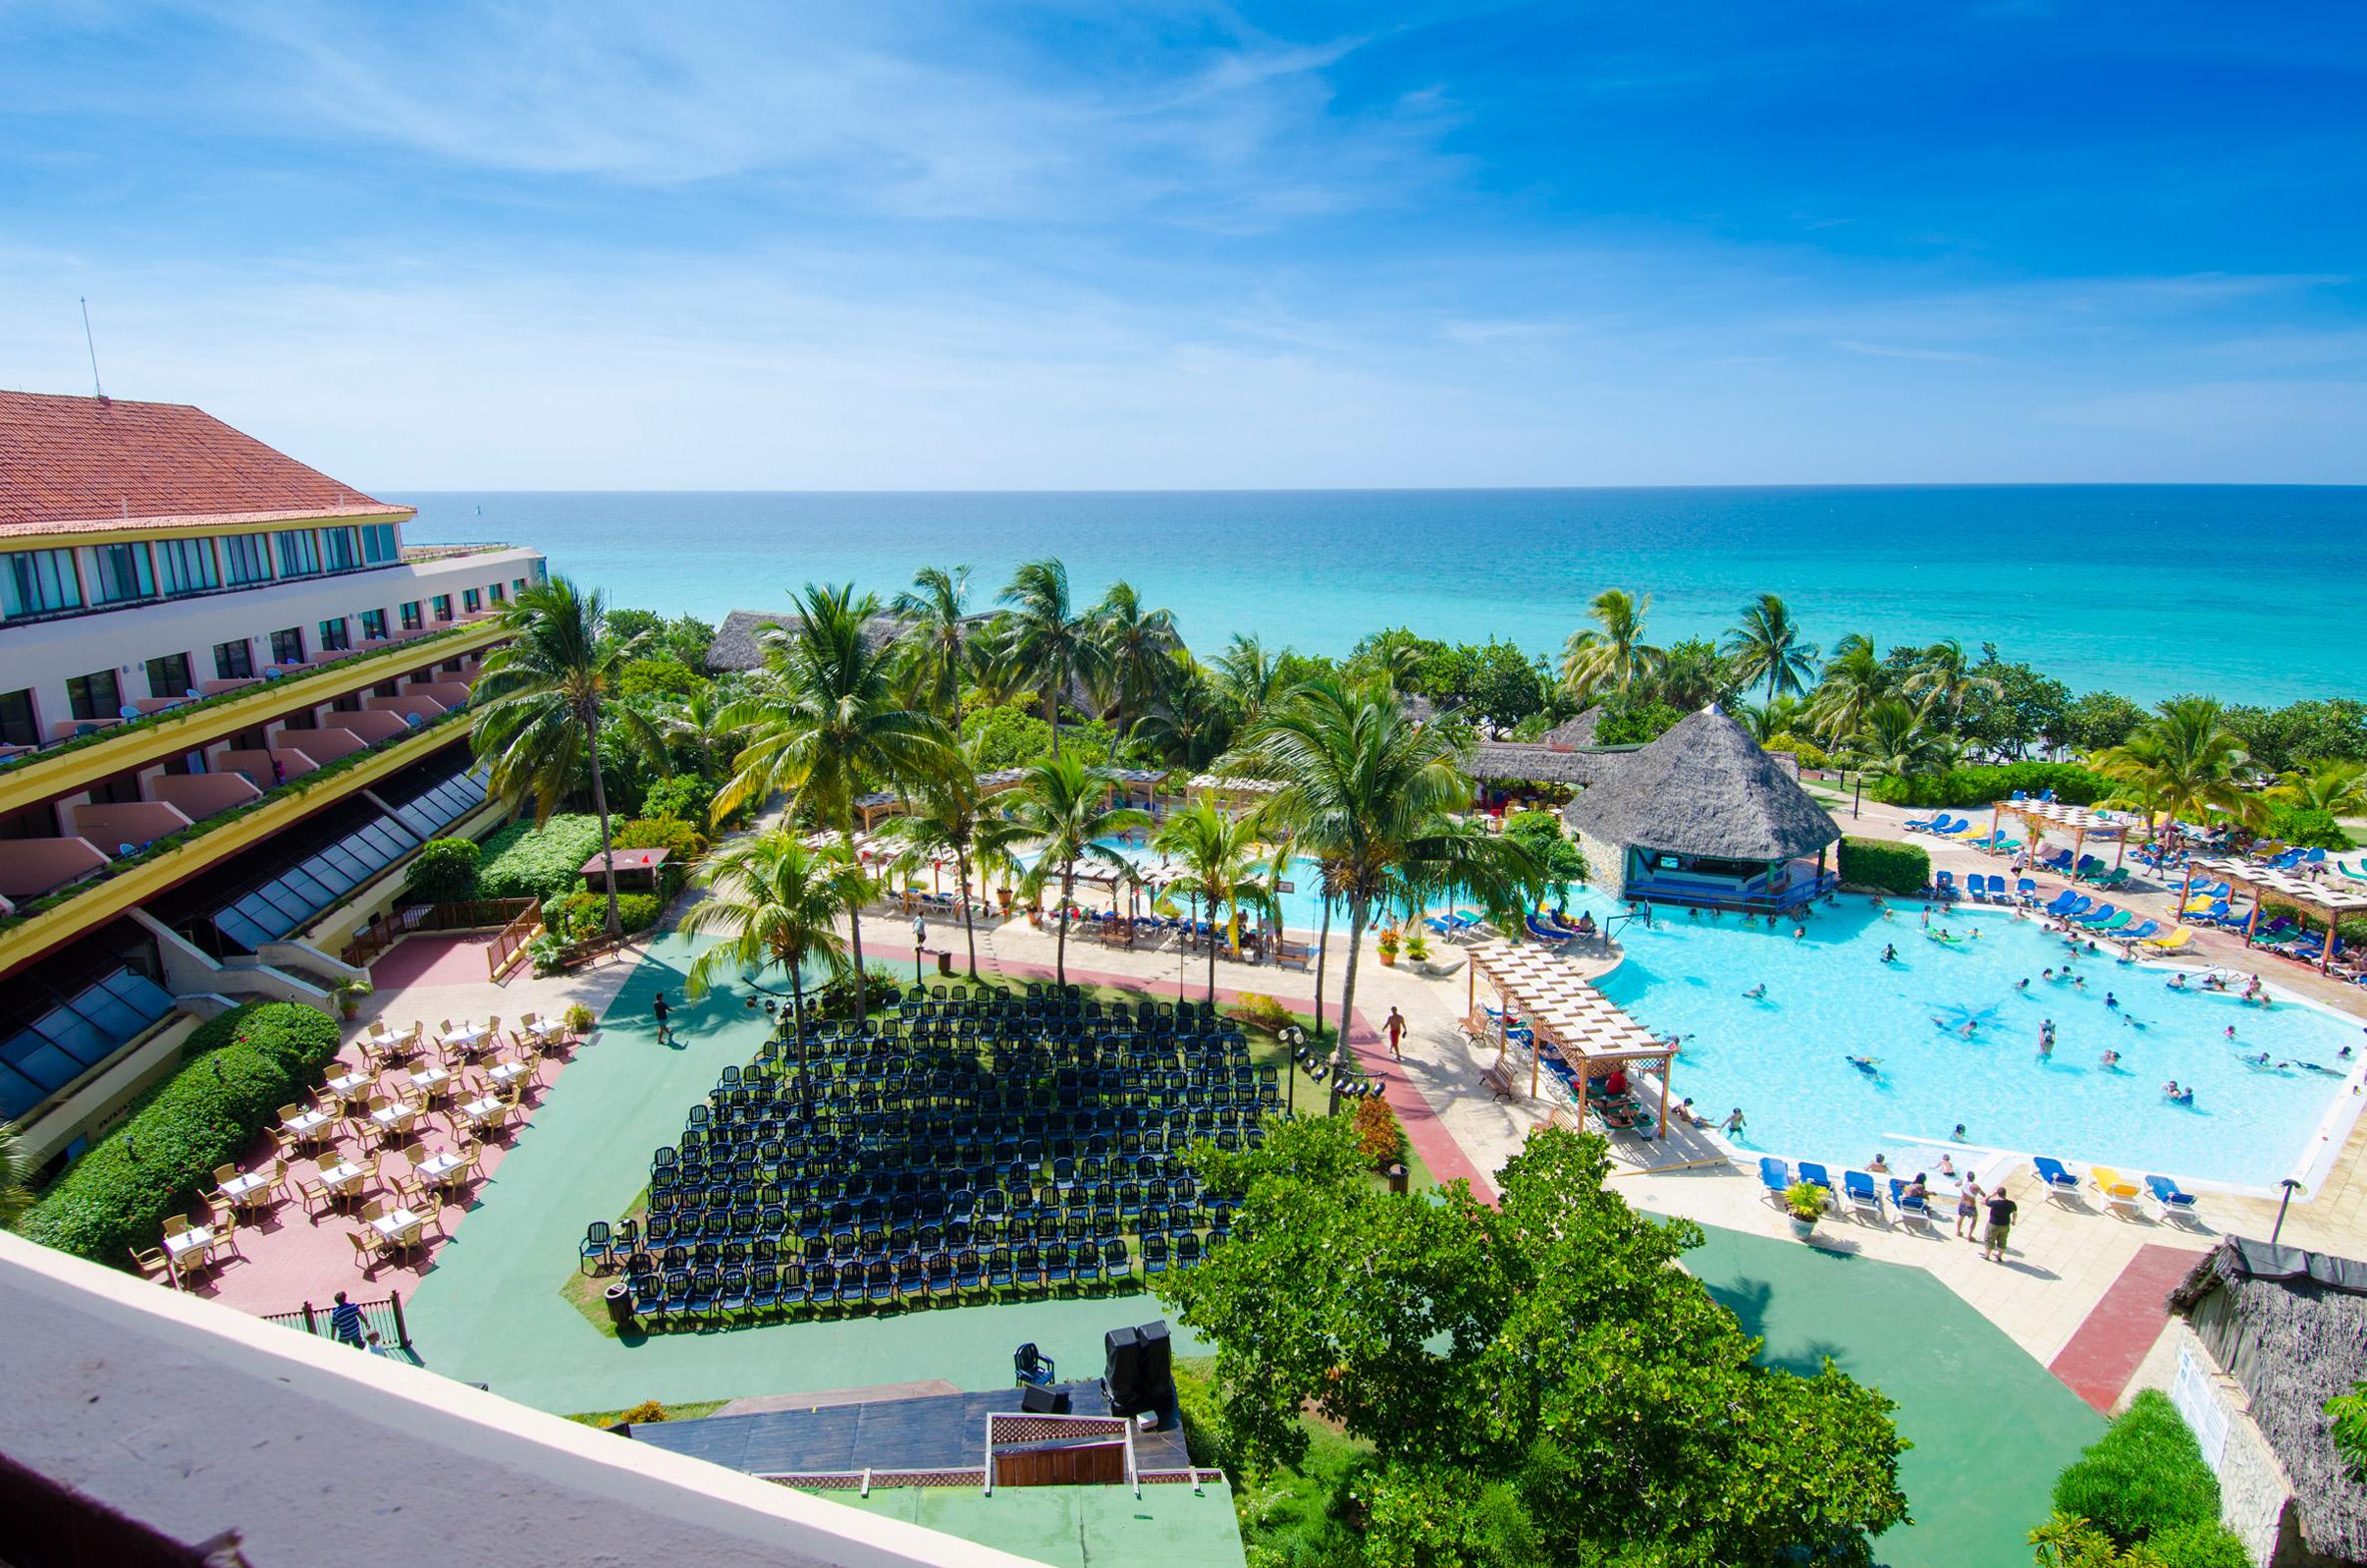 Hotel bella costa hotel section